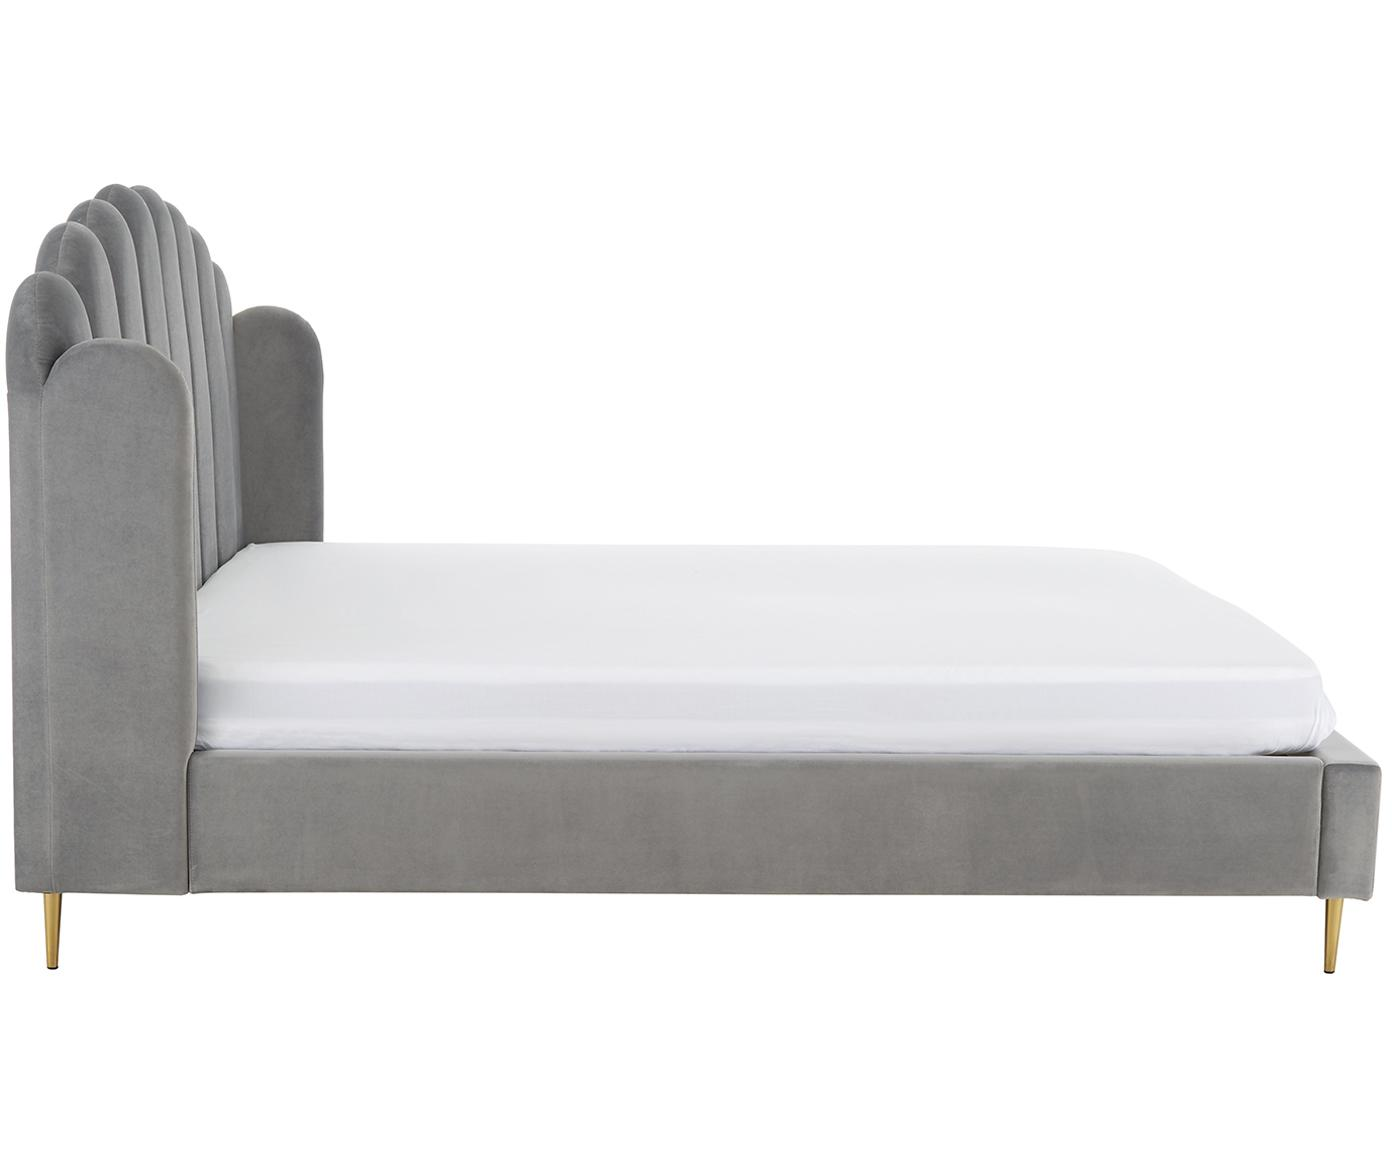 Gestoffeerd fluwelen bed Glamour, Frame: massief grenenhout, Poten: vermessingd metaal, Bekleding: fluweel (polyester), Bekleding: grijs. Poten: glanzend goudkleurig, 160 x 200 cm